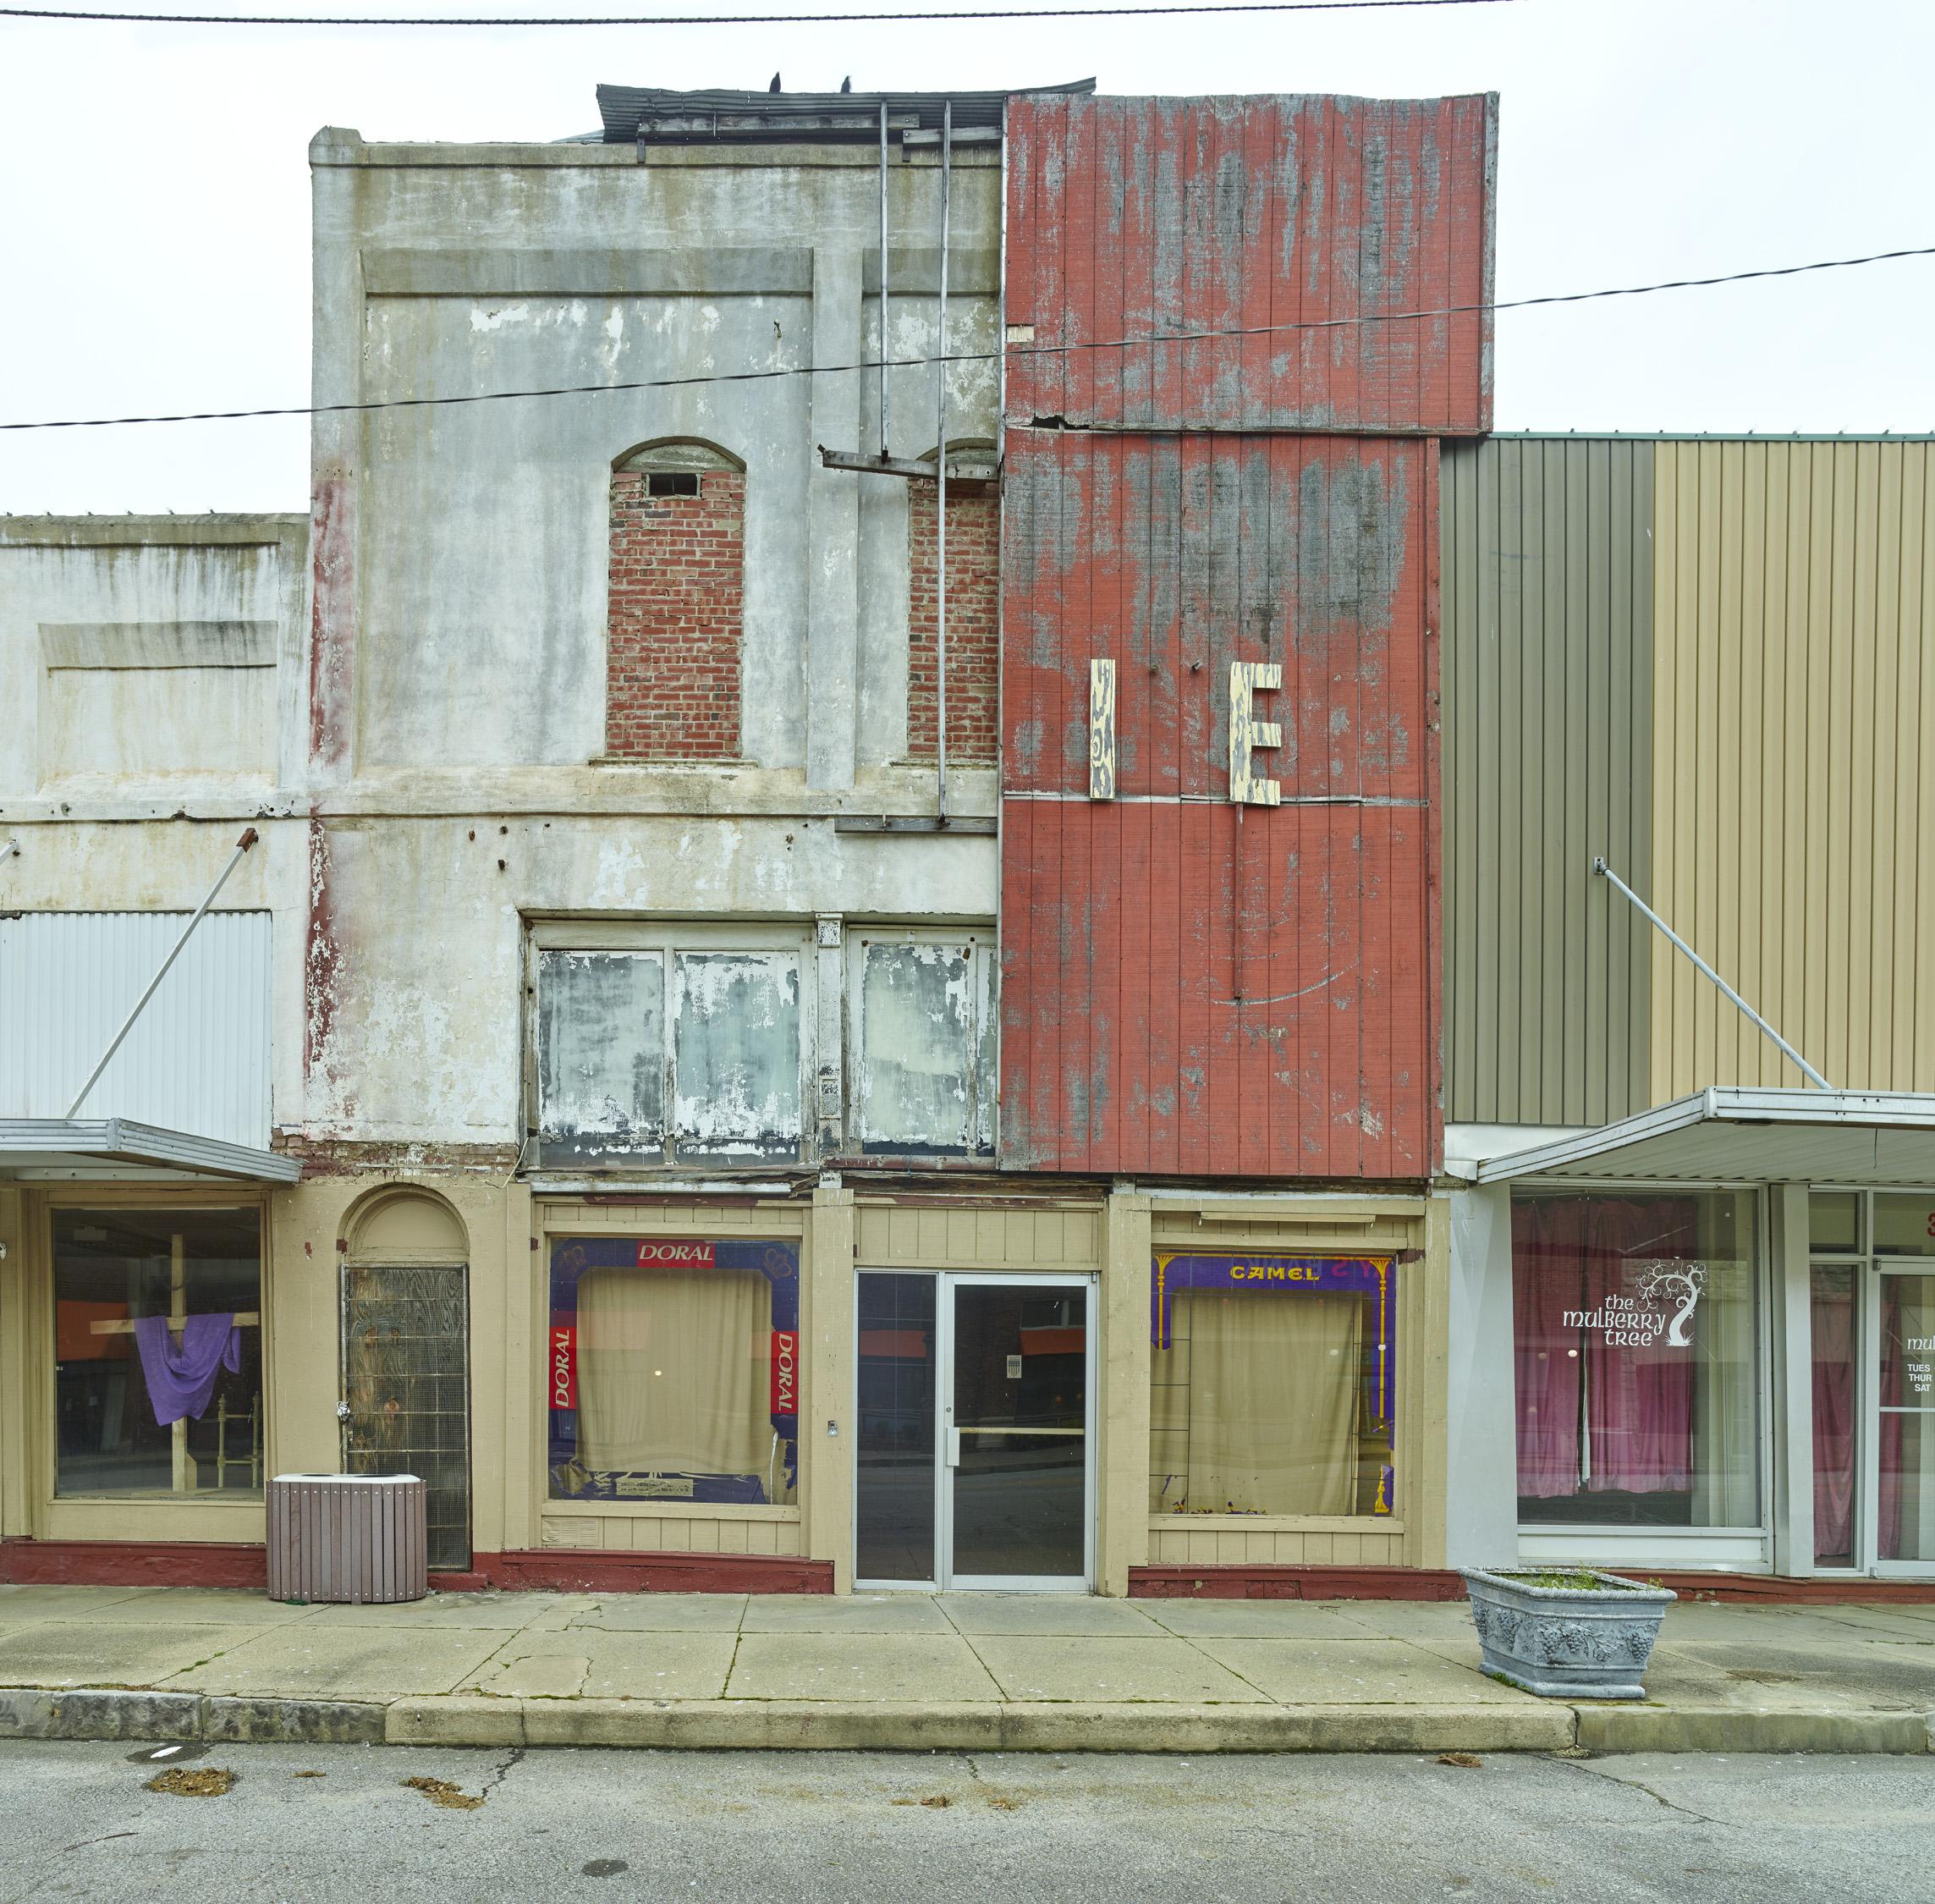 Mulberry, Arkansas